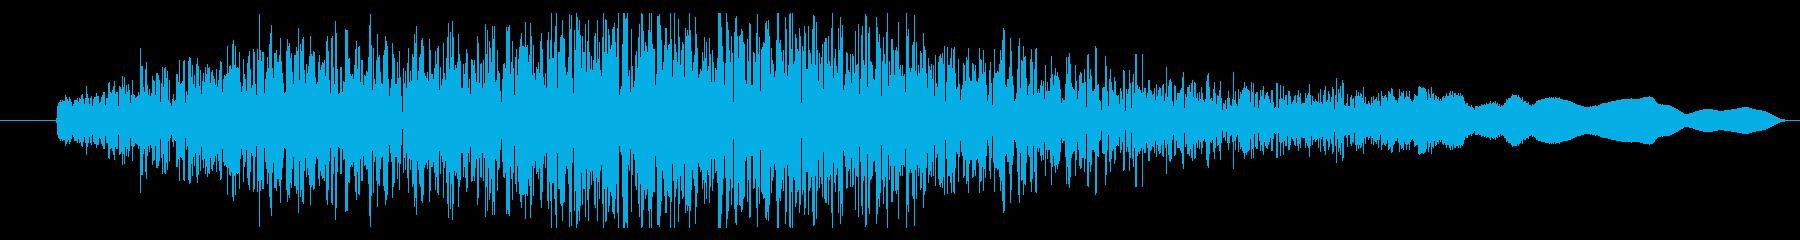 FI スペースシップ フライバイロ...の再生済みの波形